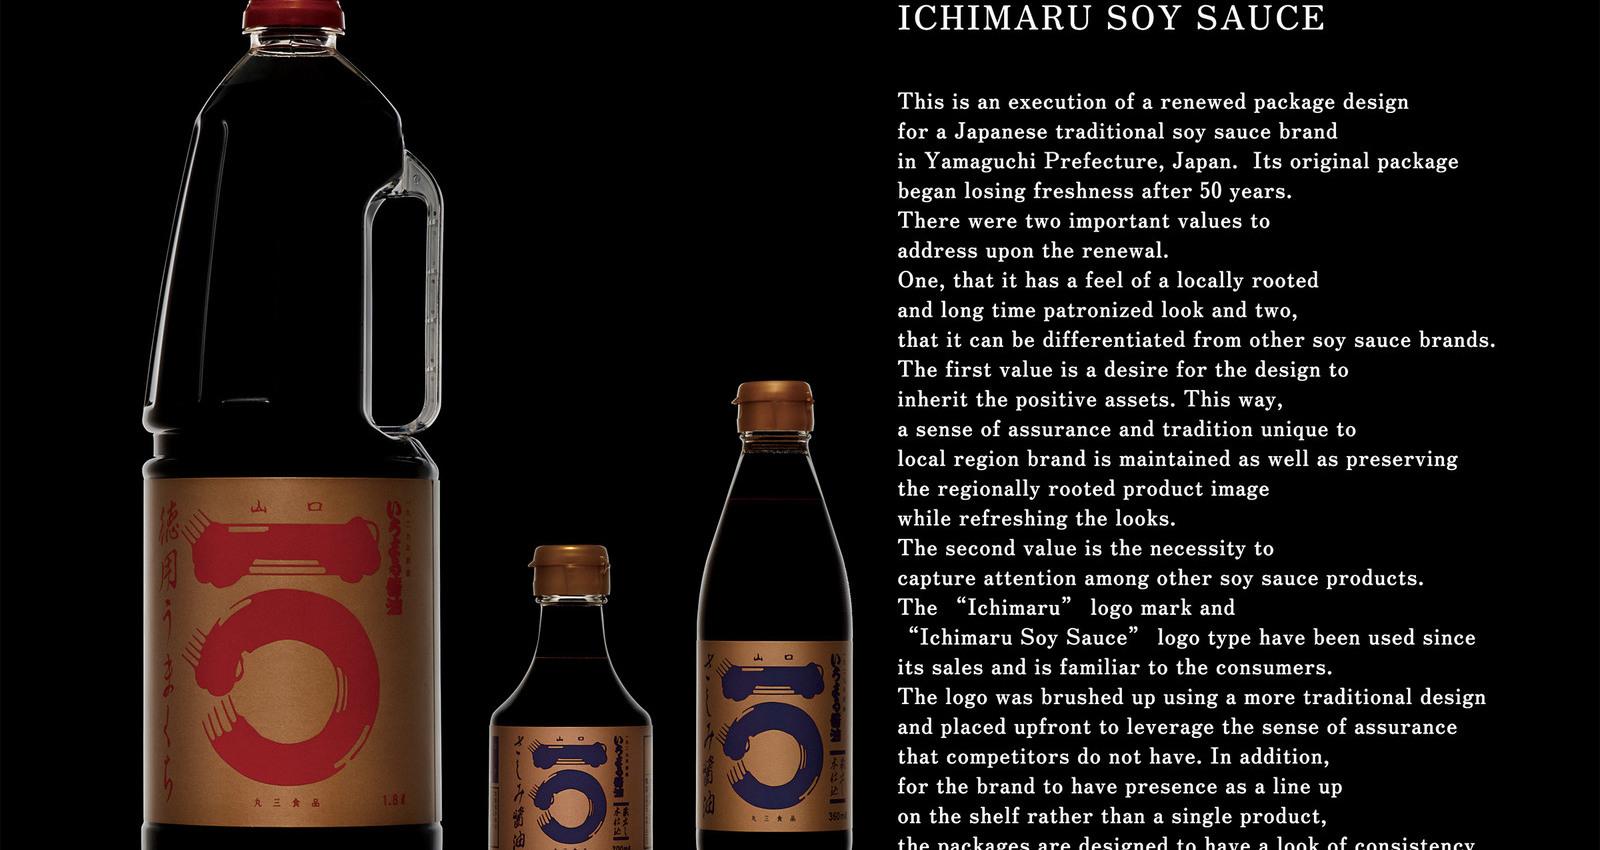 Ichimaru Soy Sauce